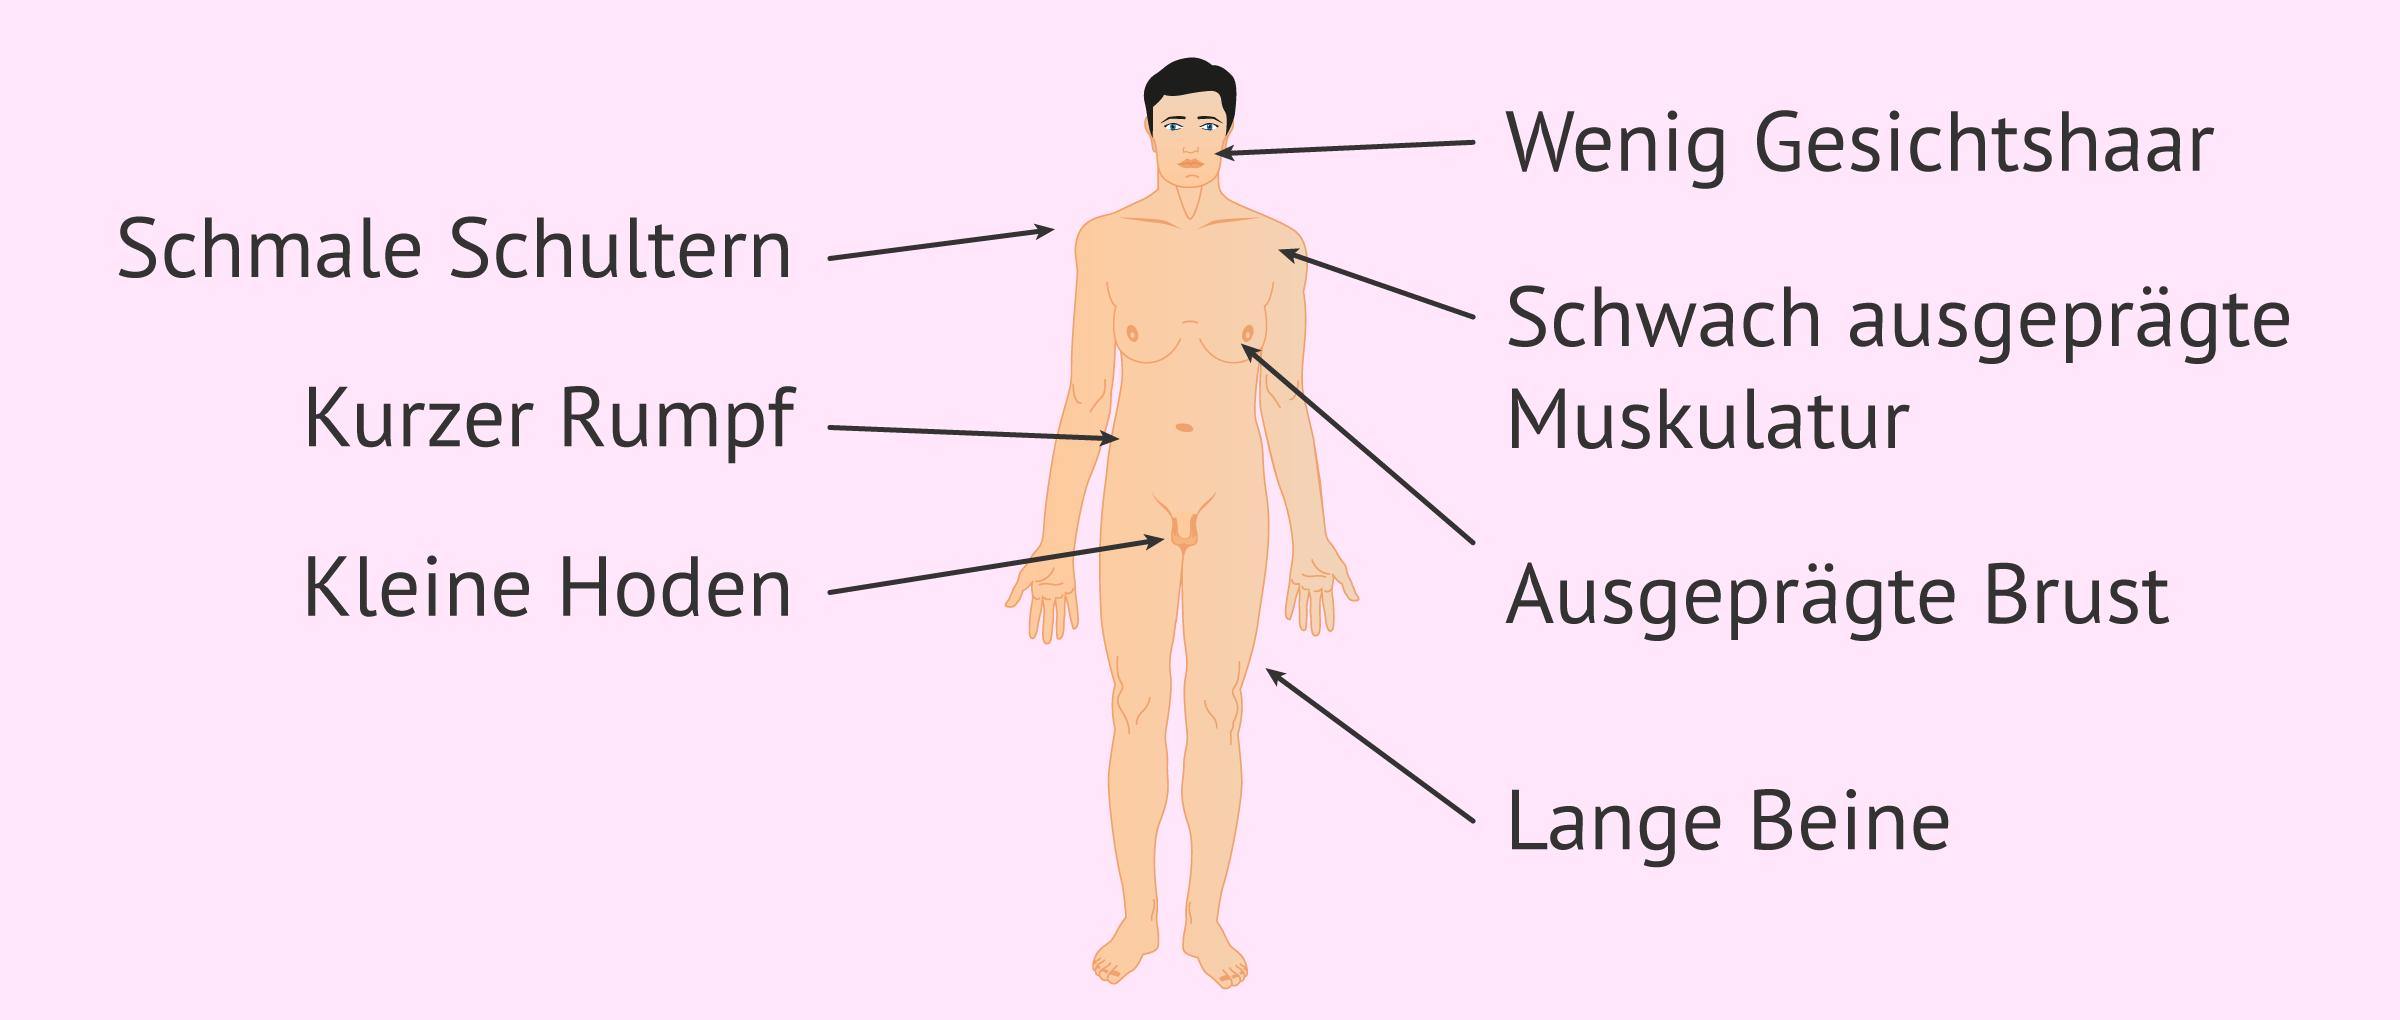 Körperliche Merkmale des Klinefelter-Syndroms